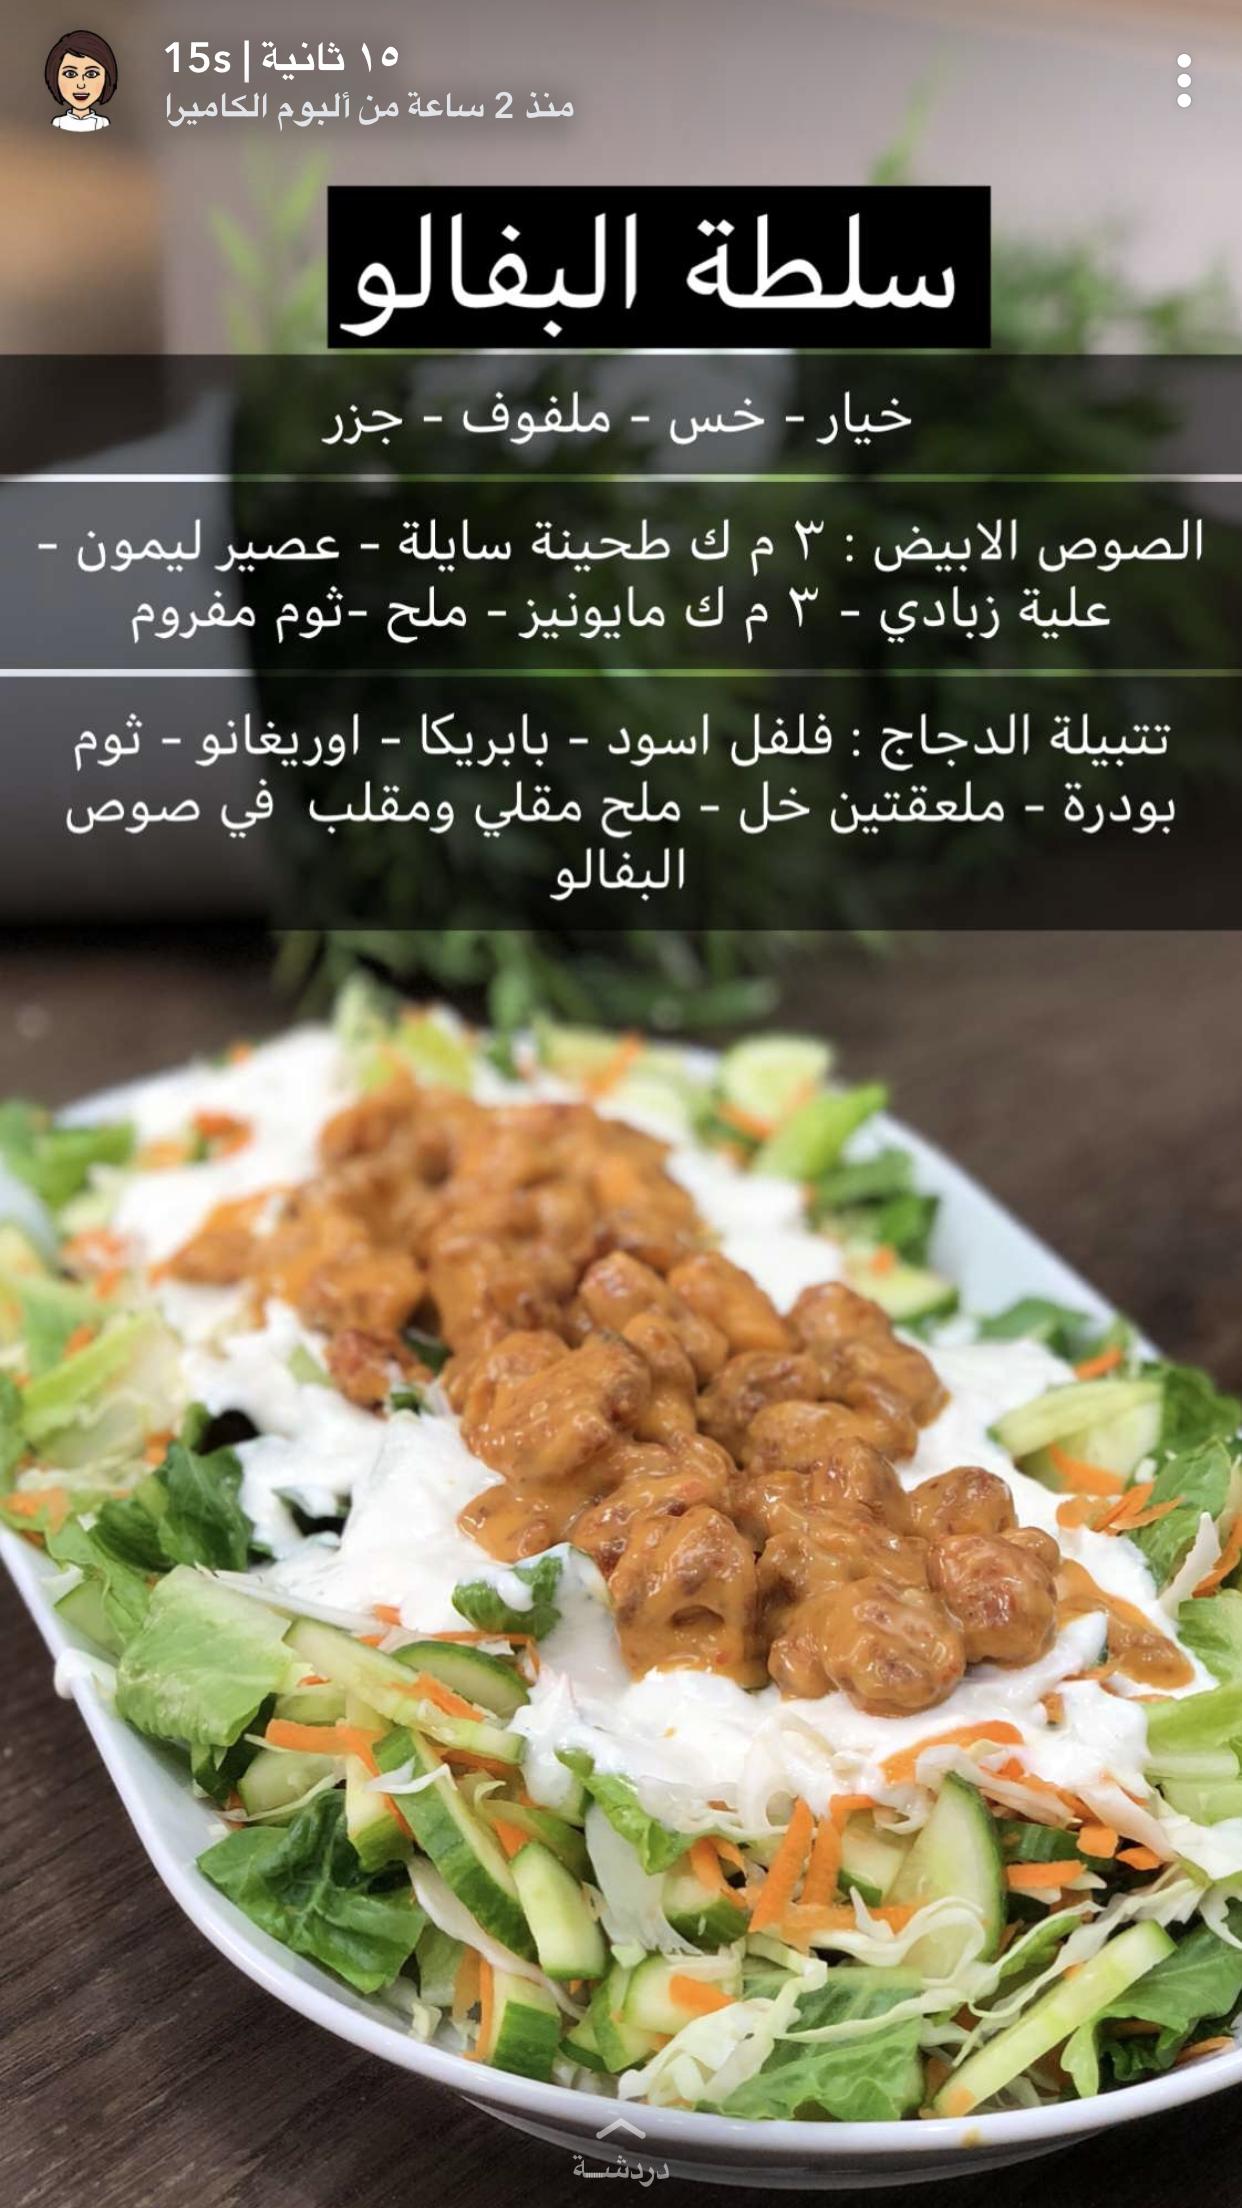 سلطة بافلوا بالصدور Cookout Food Food Receipes Food Dishes